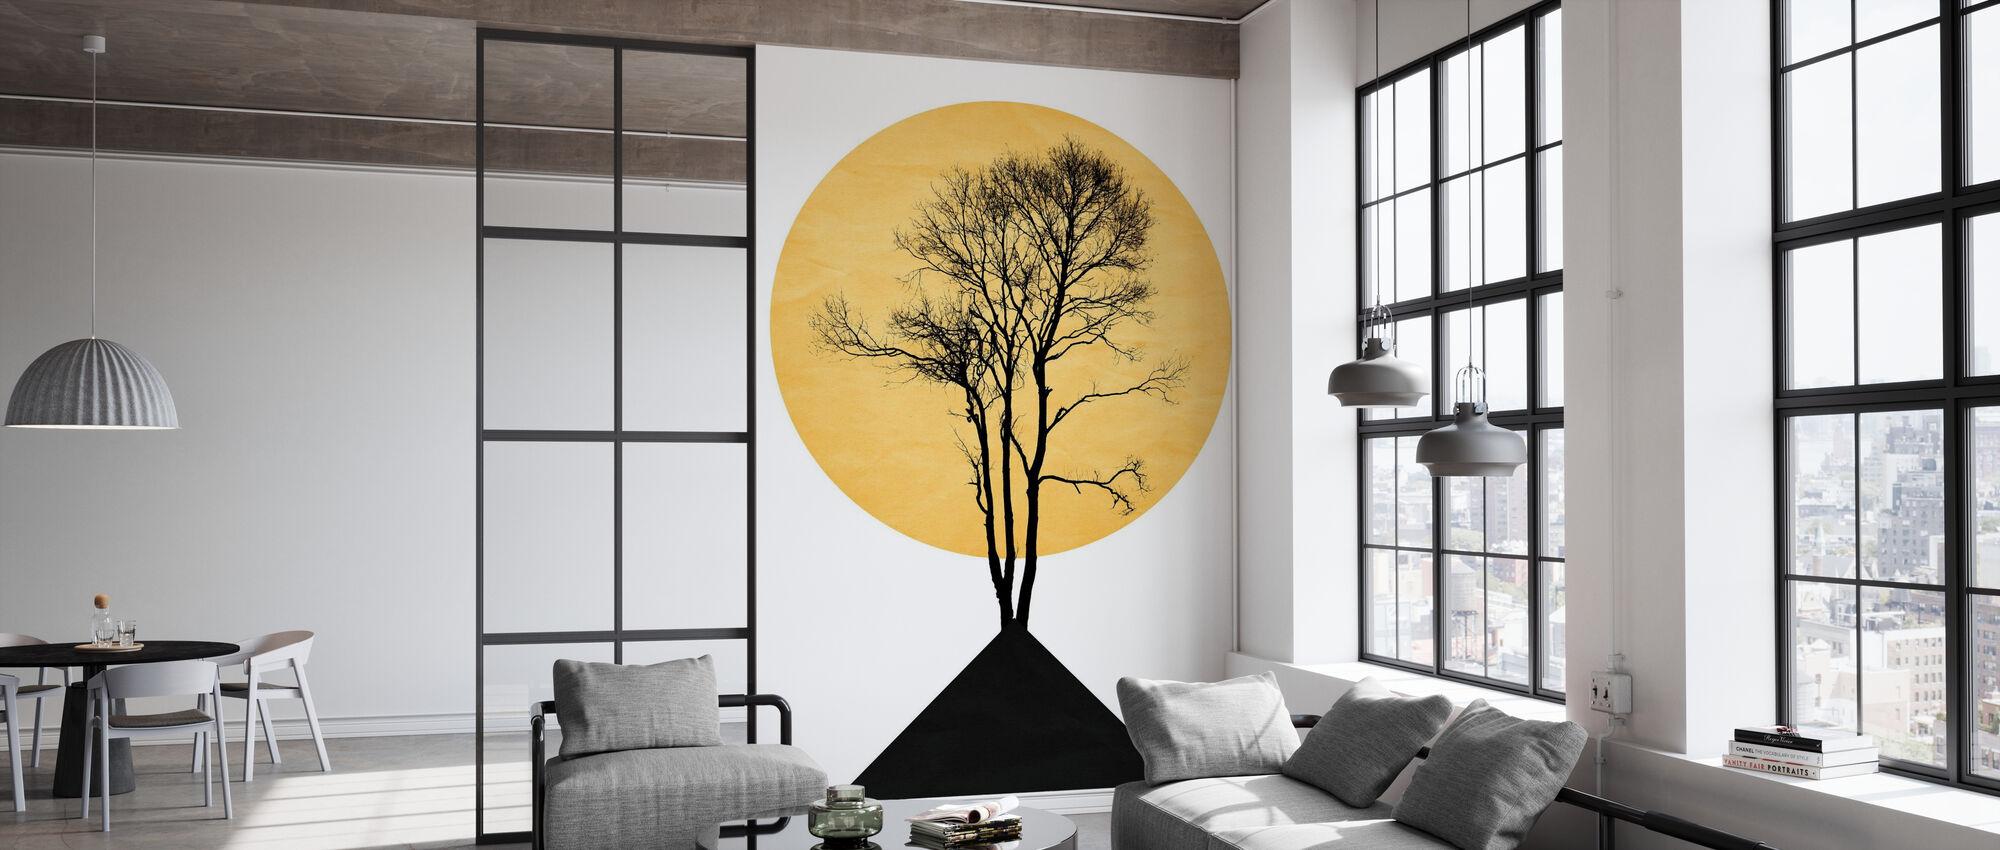 Japanese Zen - Wallpaper - Office